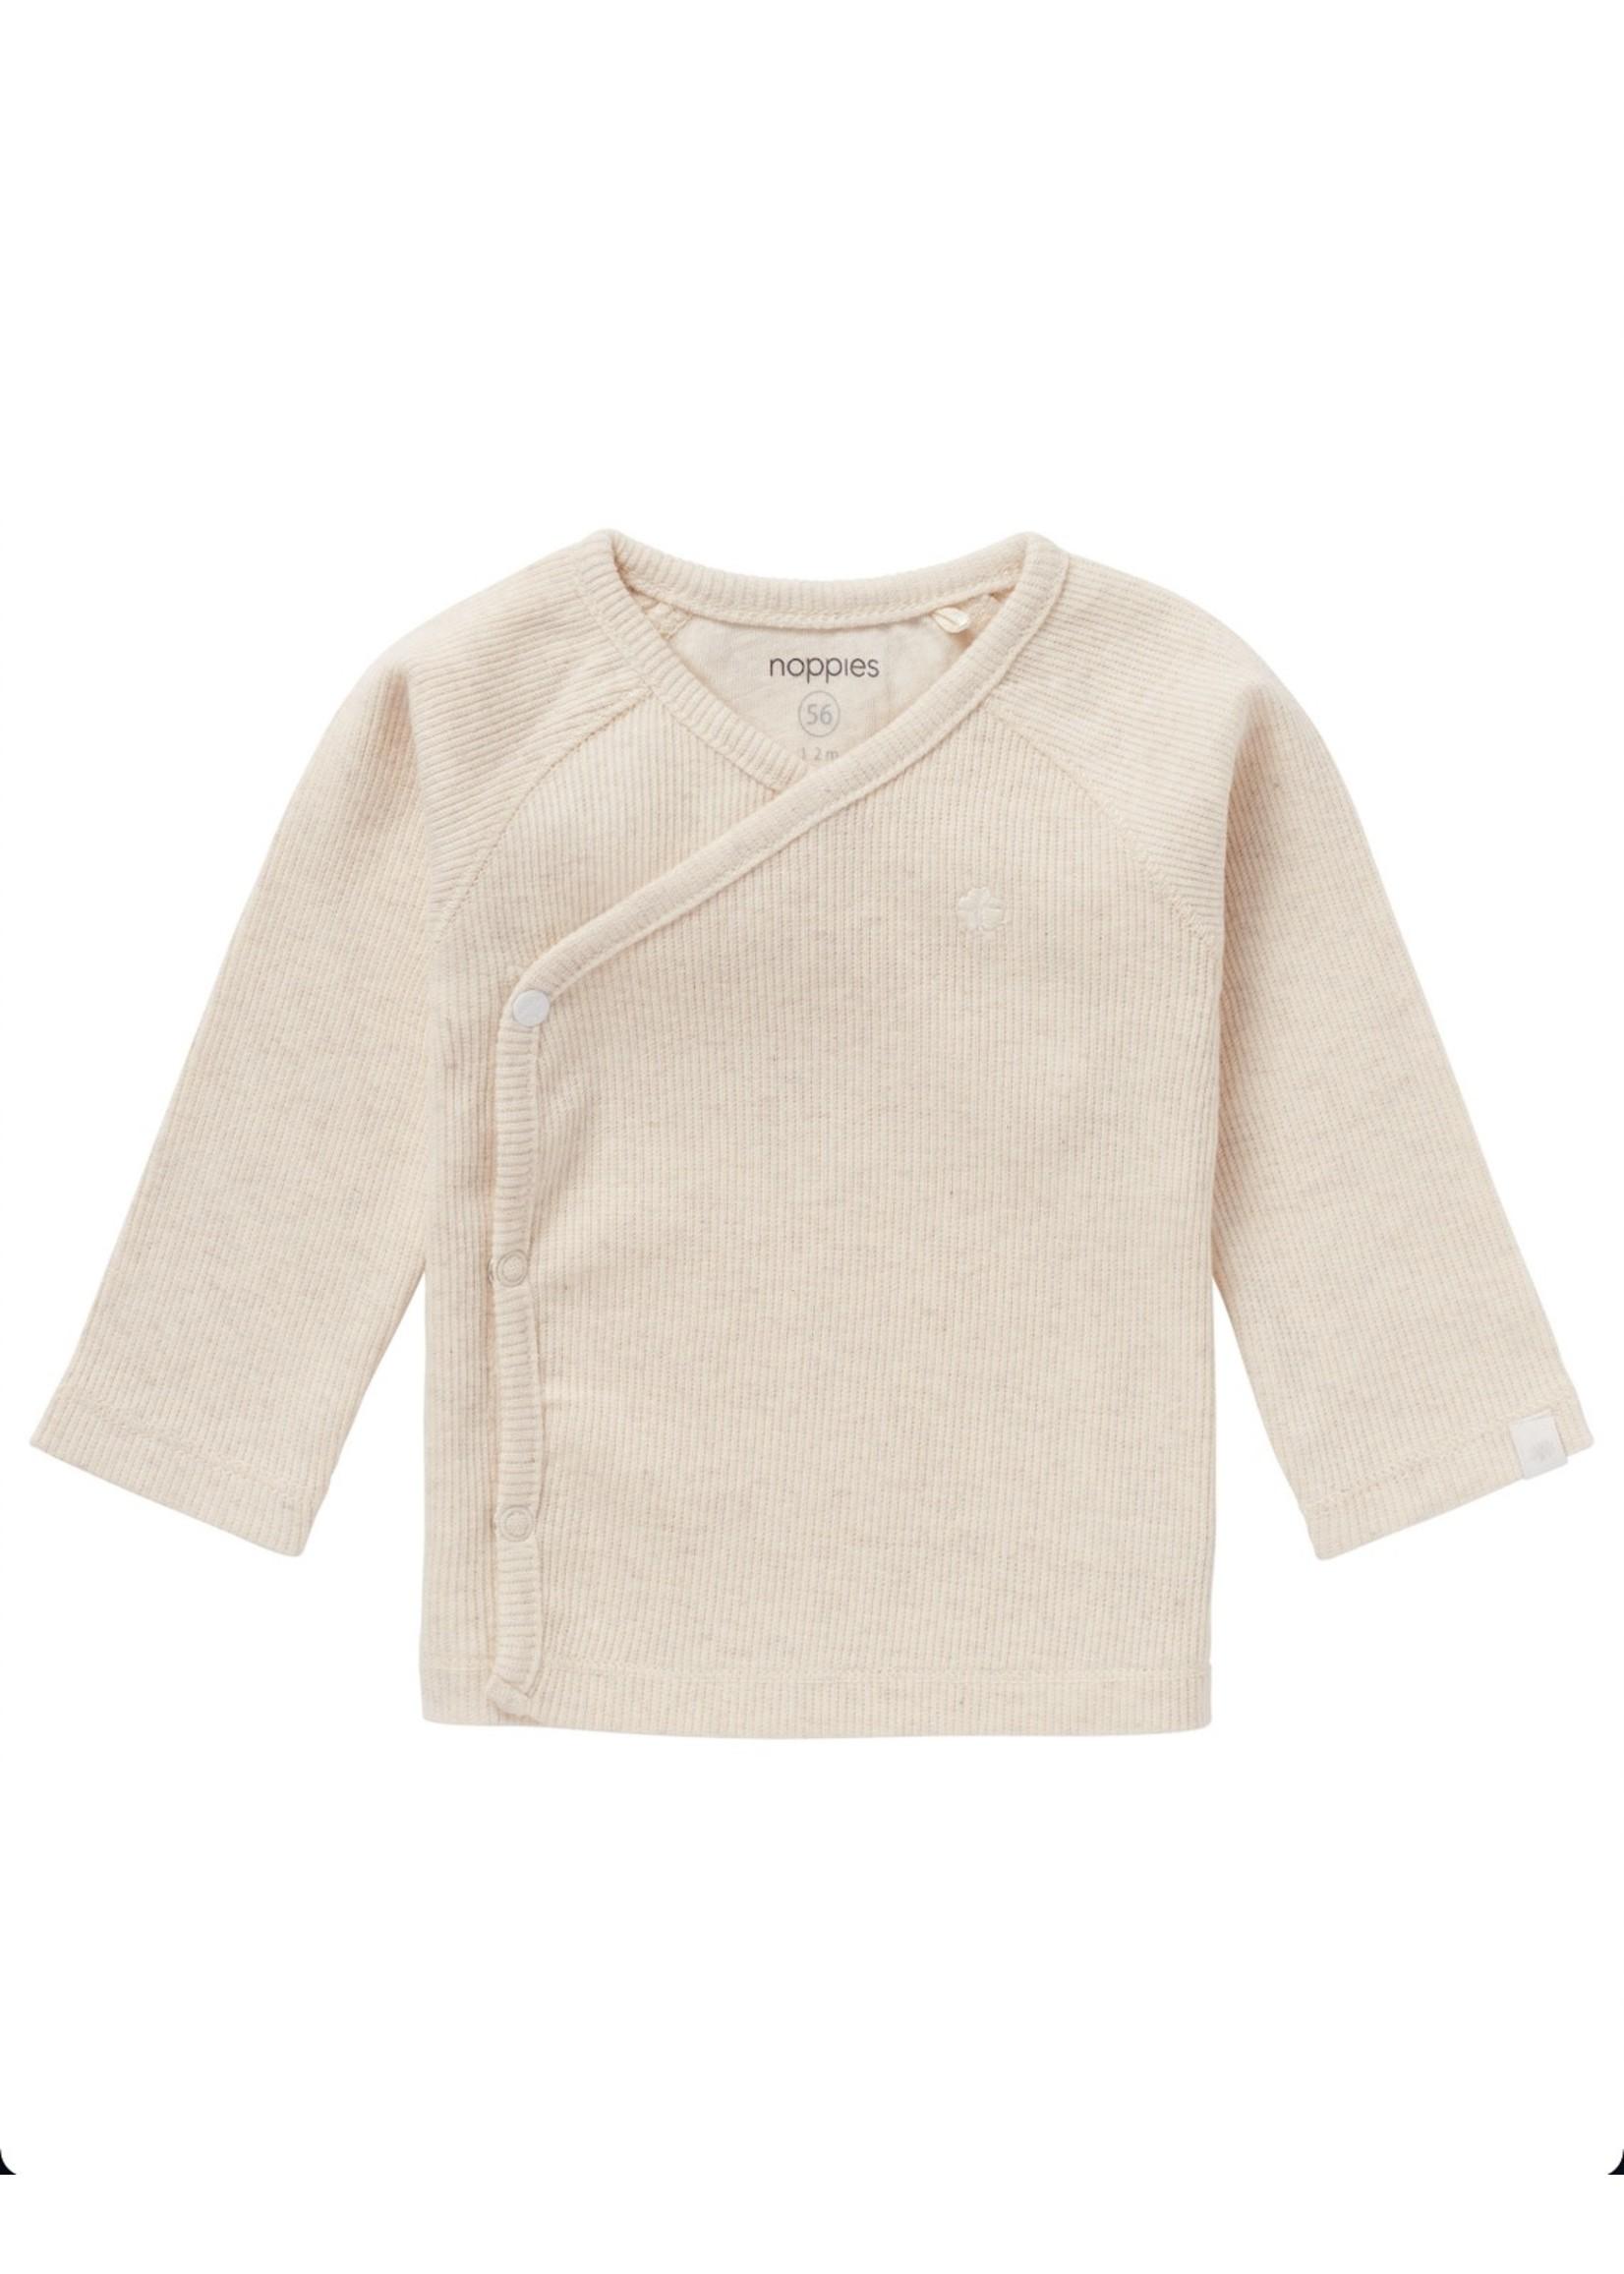 Noppies Kids Noppies Kids, Unisex Nanyuki Ribbed Long Sleeve Top in Oatmeal